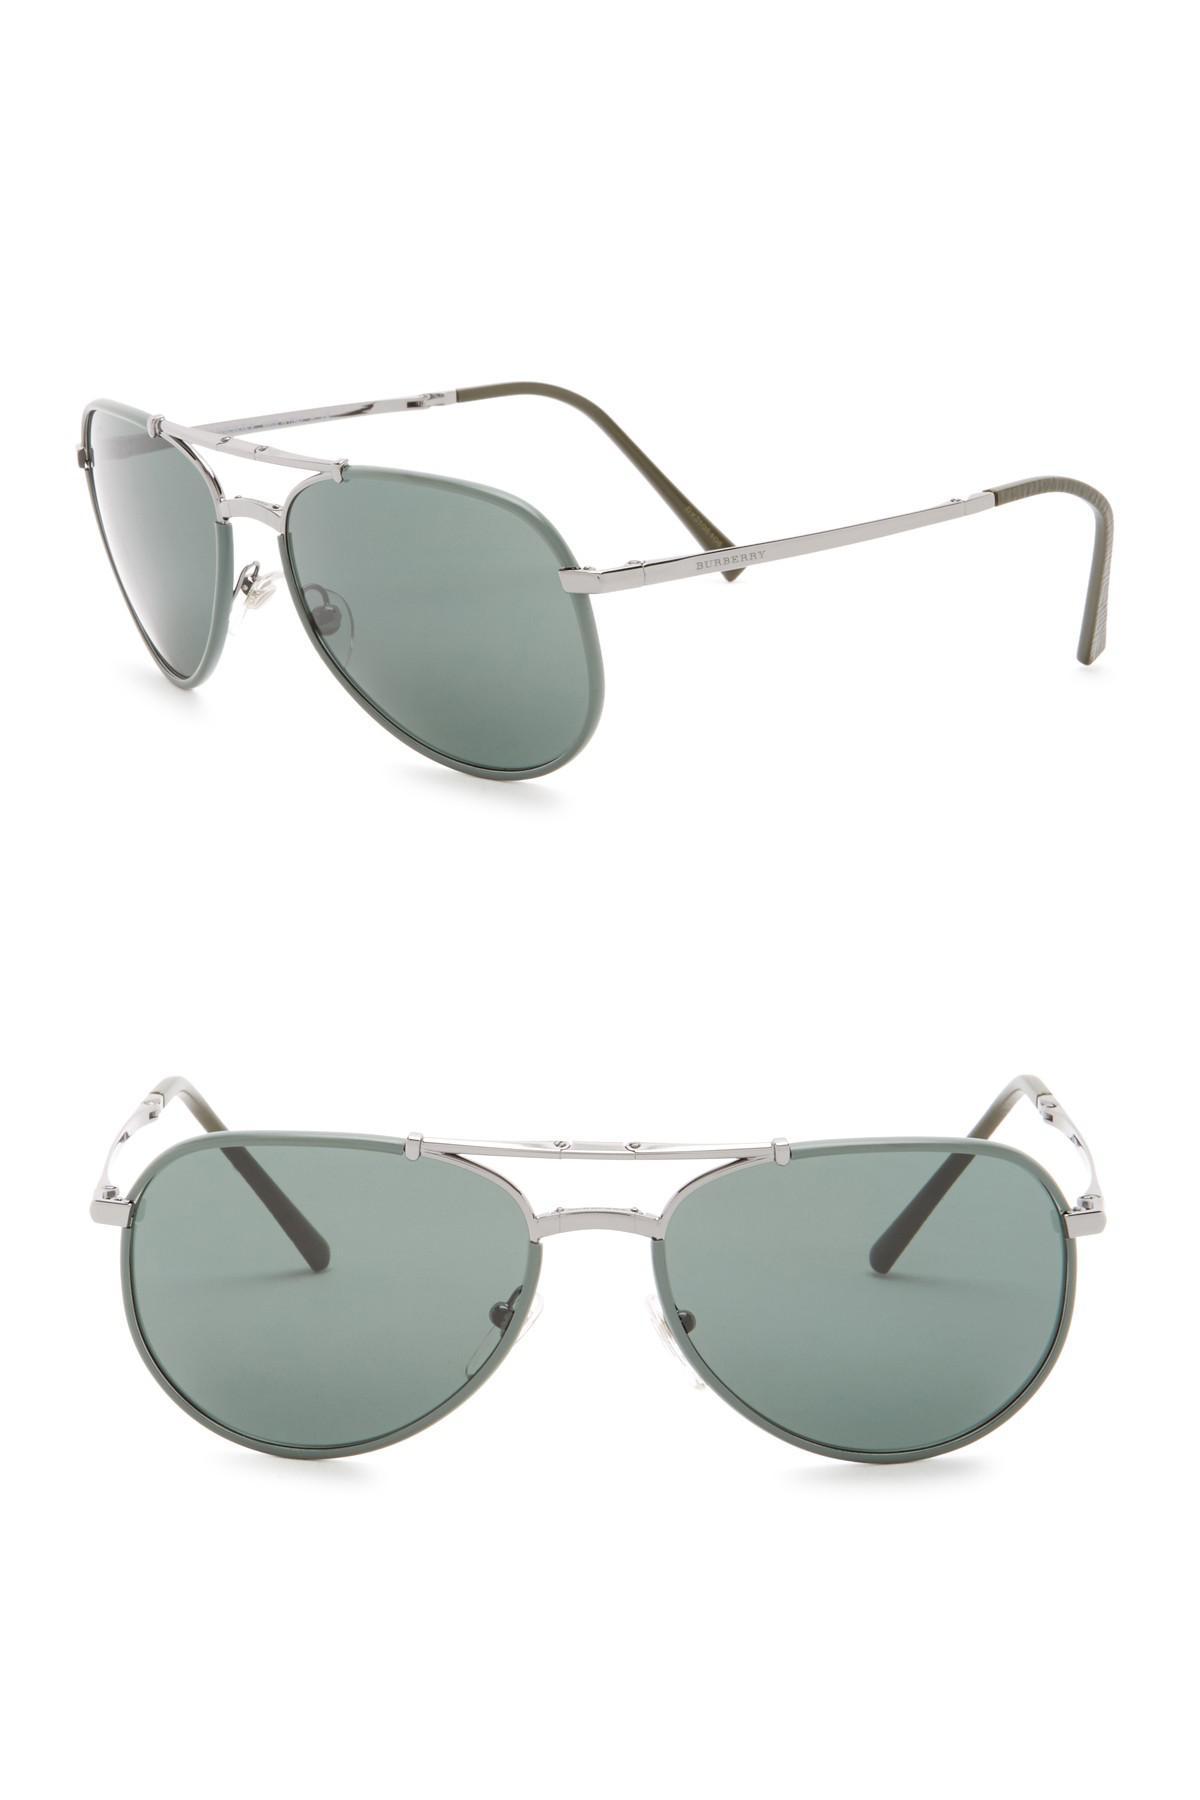 b0ab89efec7 Lyst - Burberry 58mm Folding Aviator Sunglasses